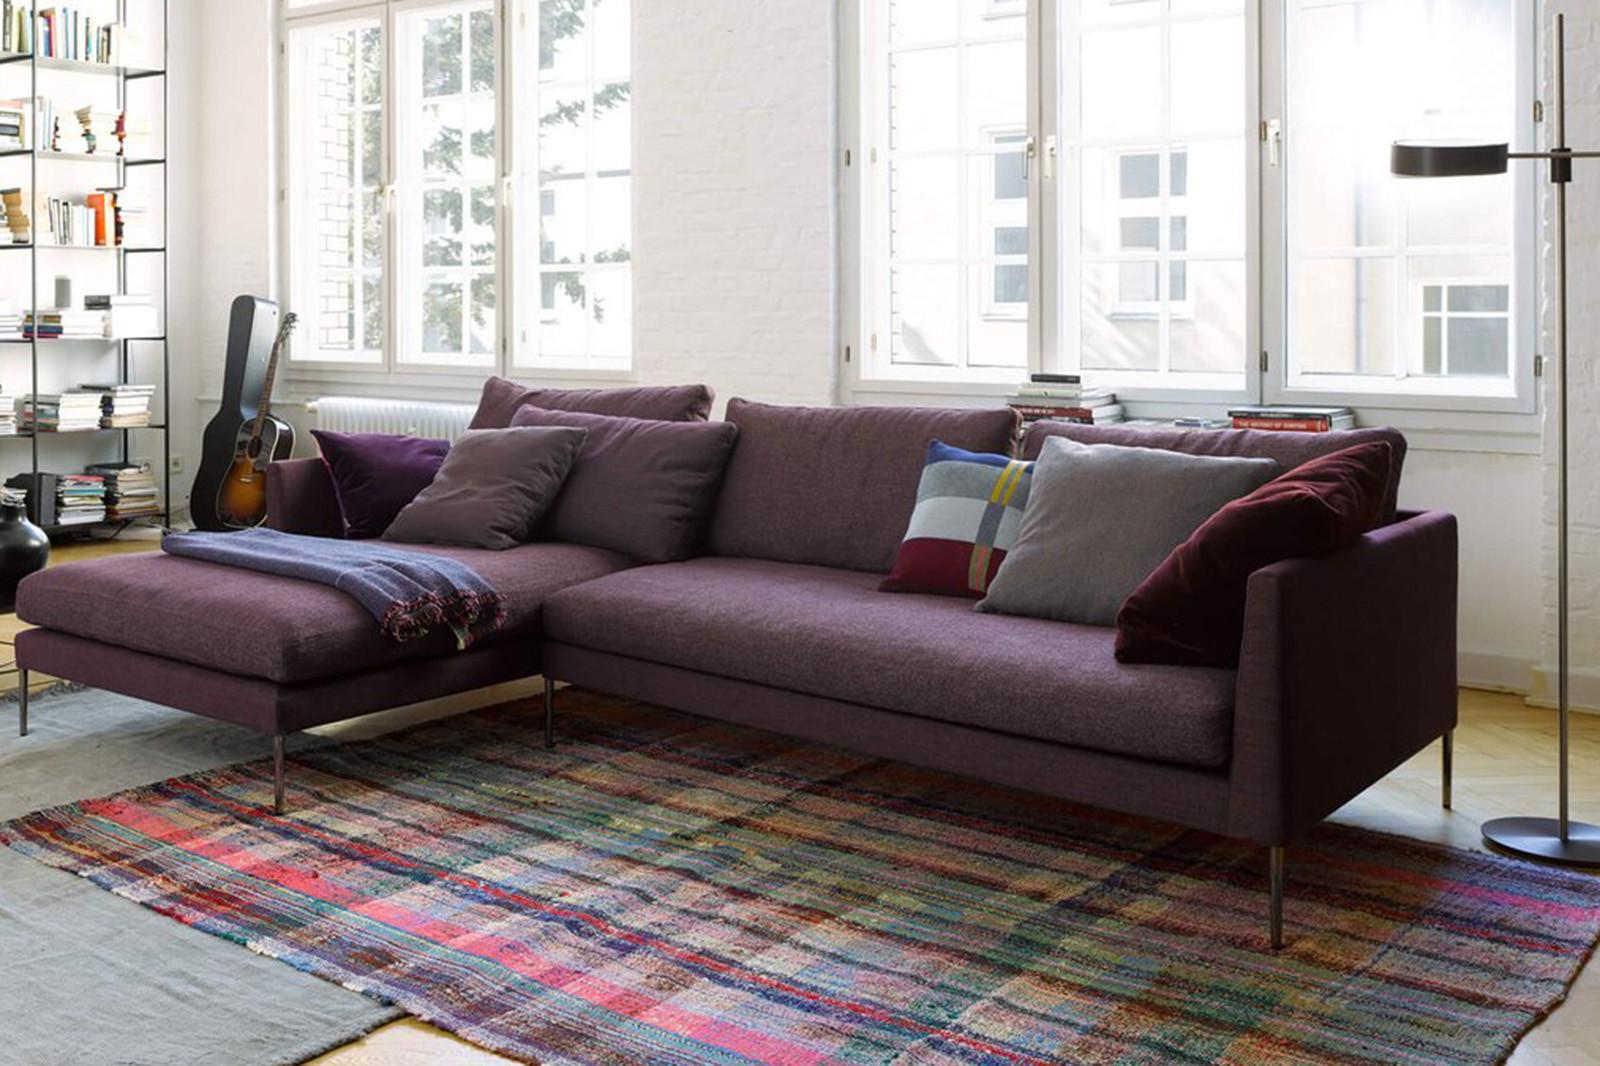 Sofa Mehrzahl  Sofa Bodennah Affordable Sofa Mod Alina Zurck With Sofa